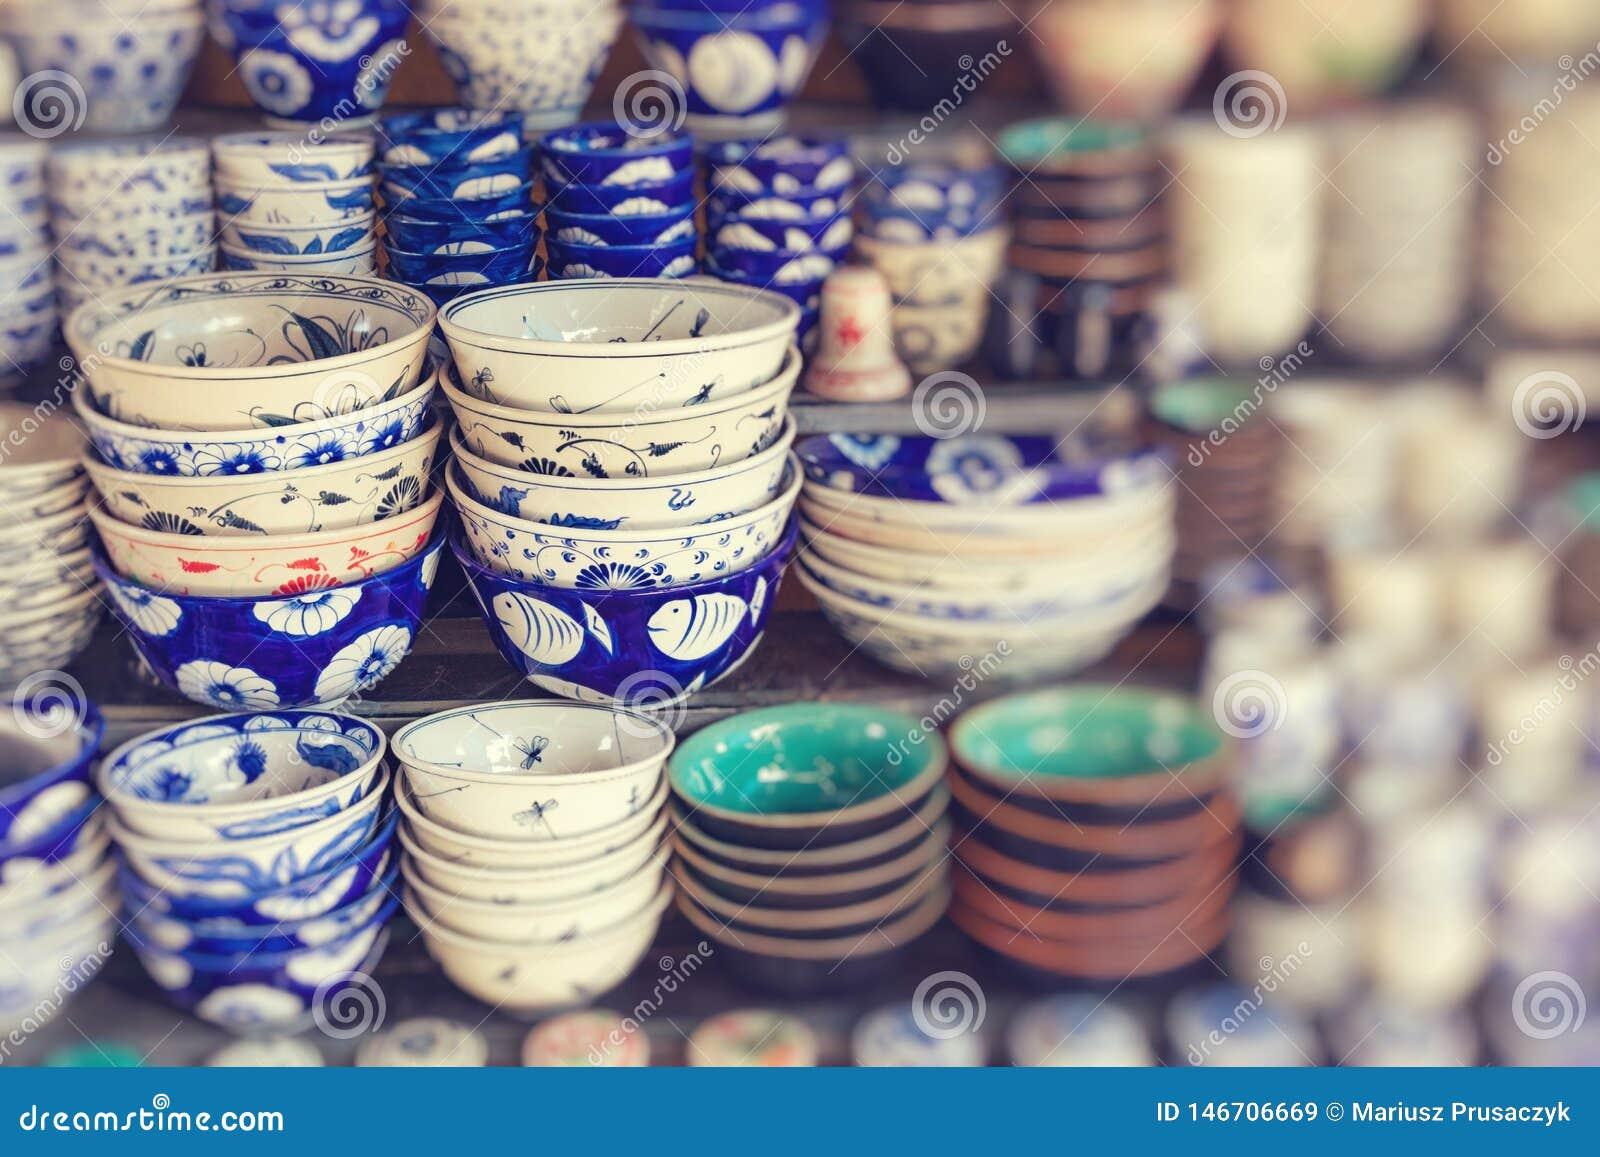 S?ljs traditionella souvenir f?r Vietnam ` s in shoppar p? den gamla fj?rdedelen f?r Hanoi ` s vietnam Selektivt fokusera